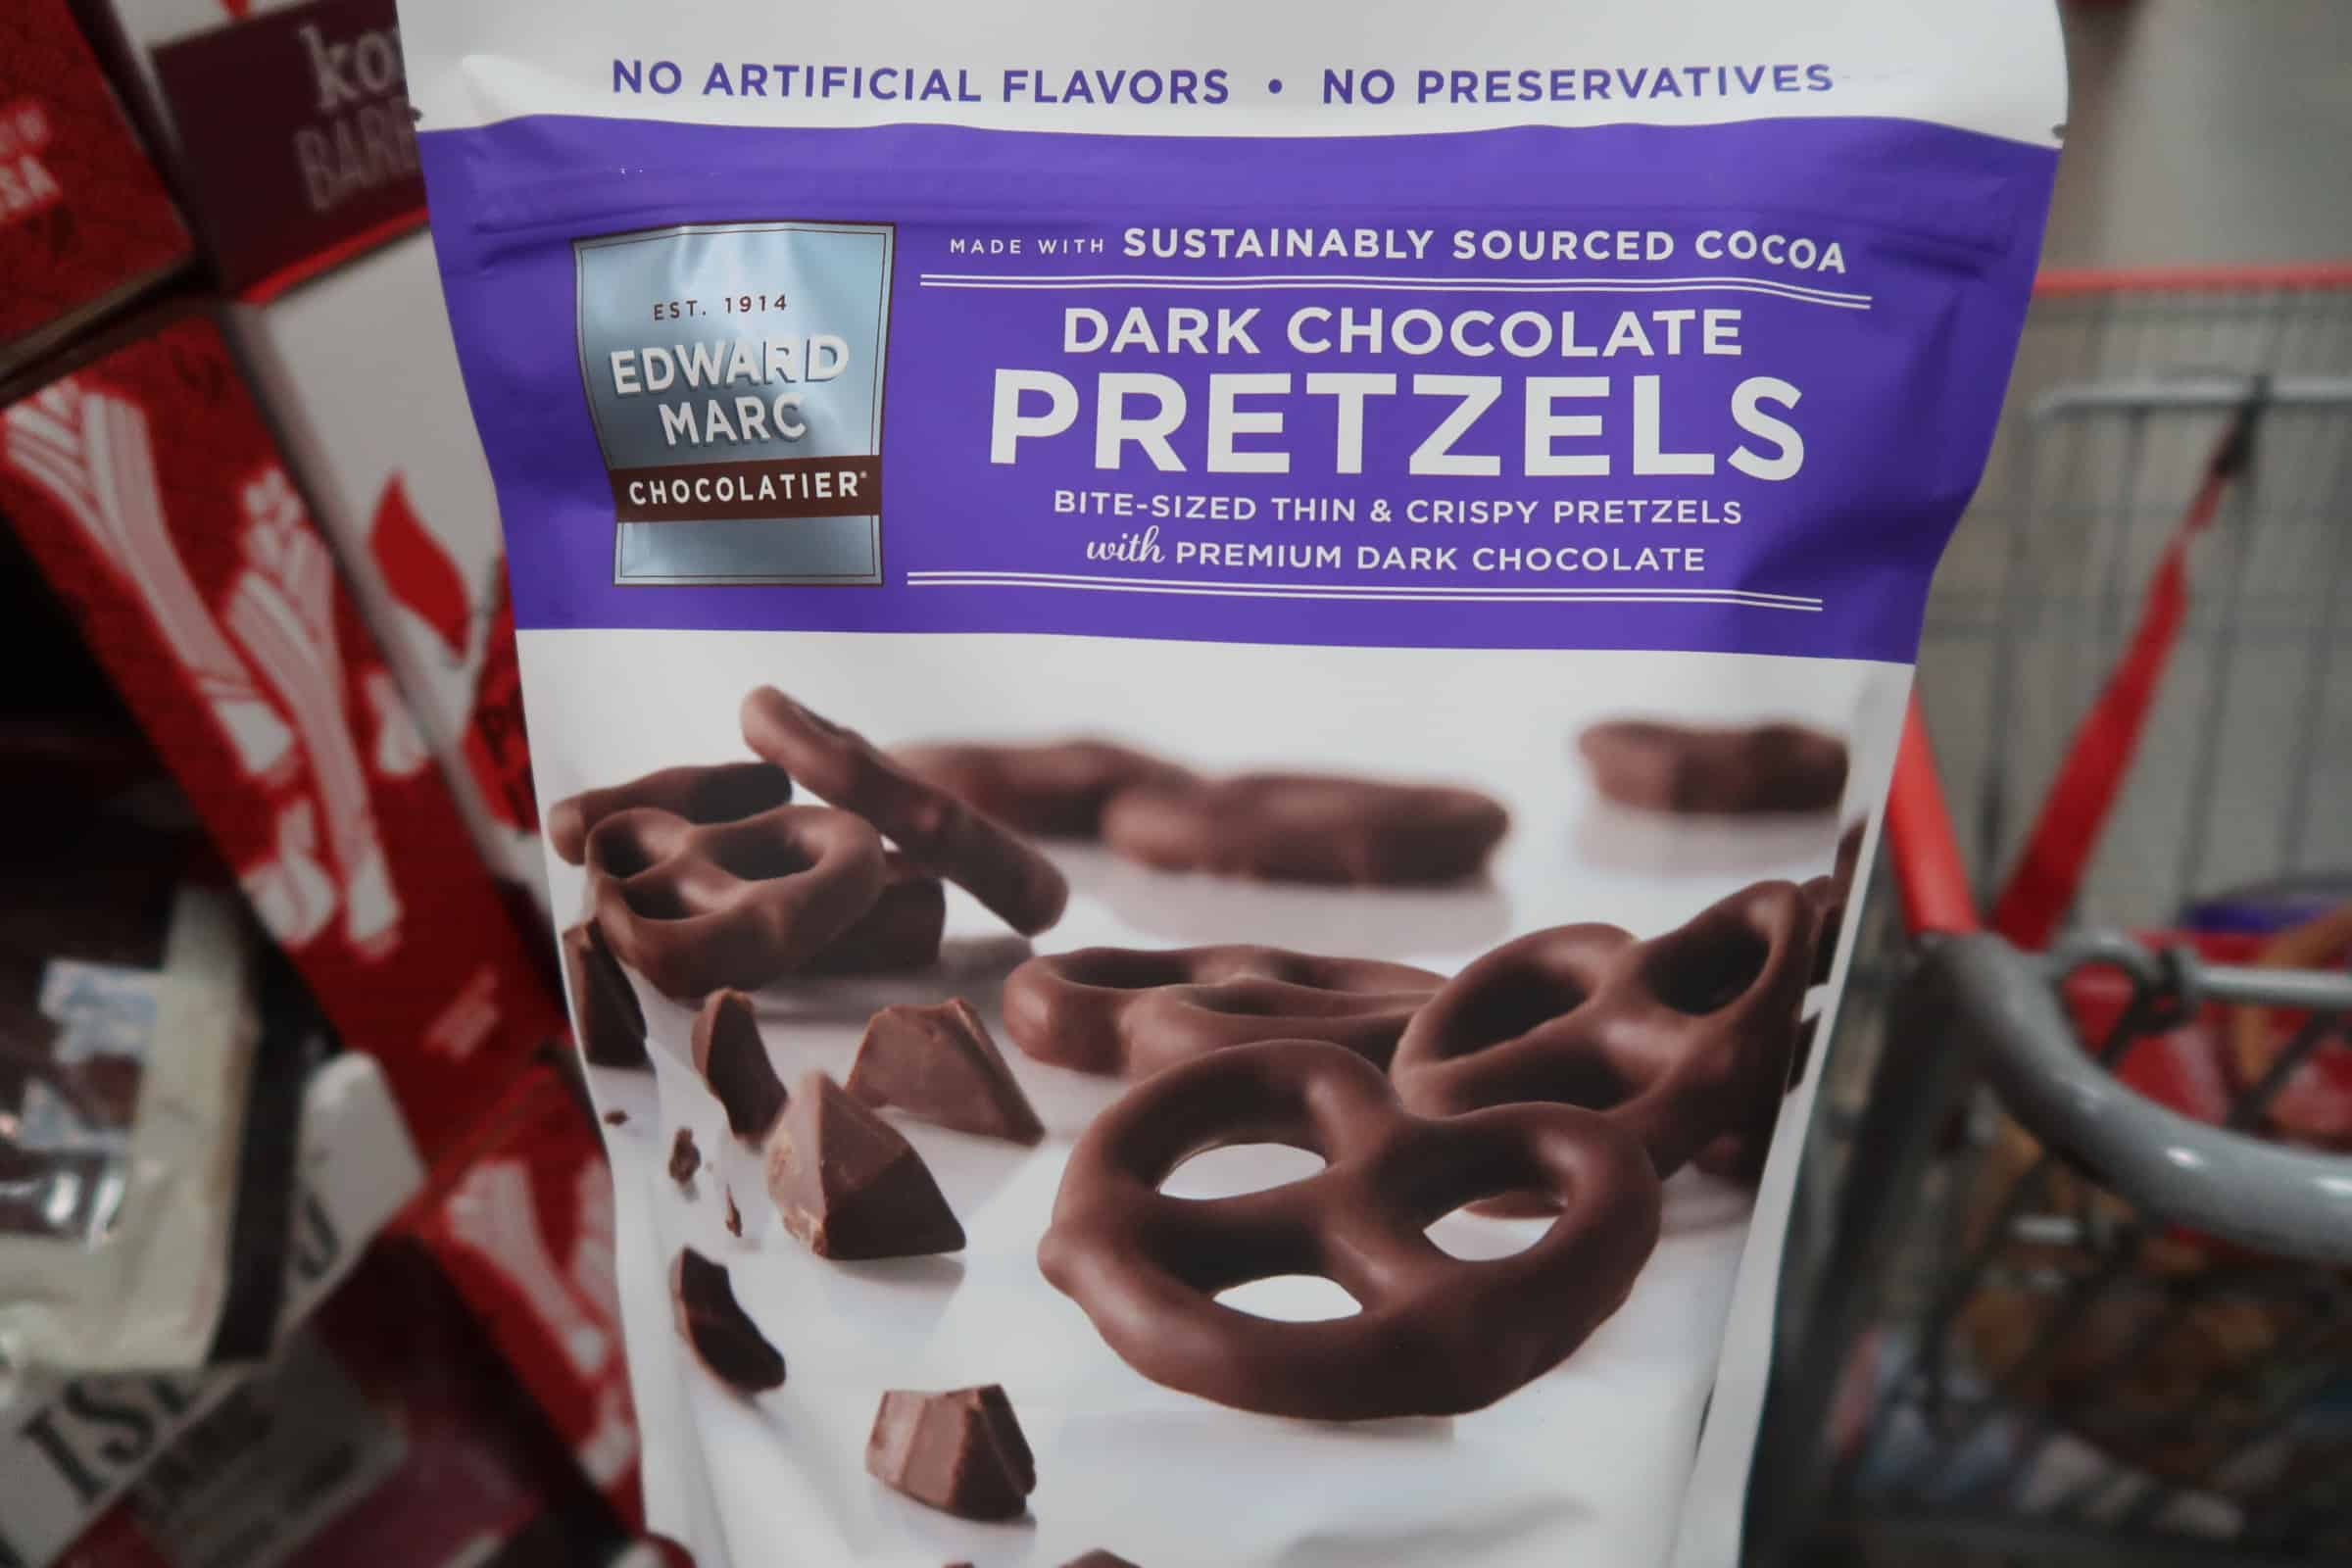 dark chocolate covered pretzels Costco